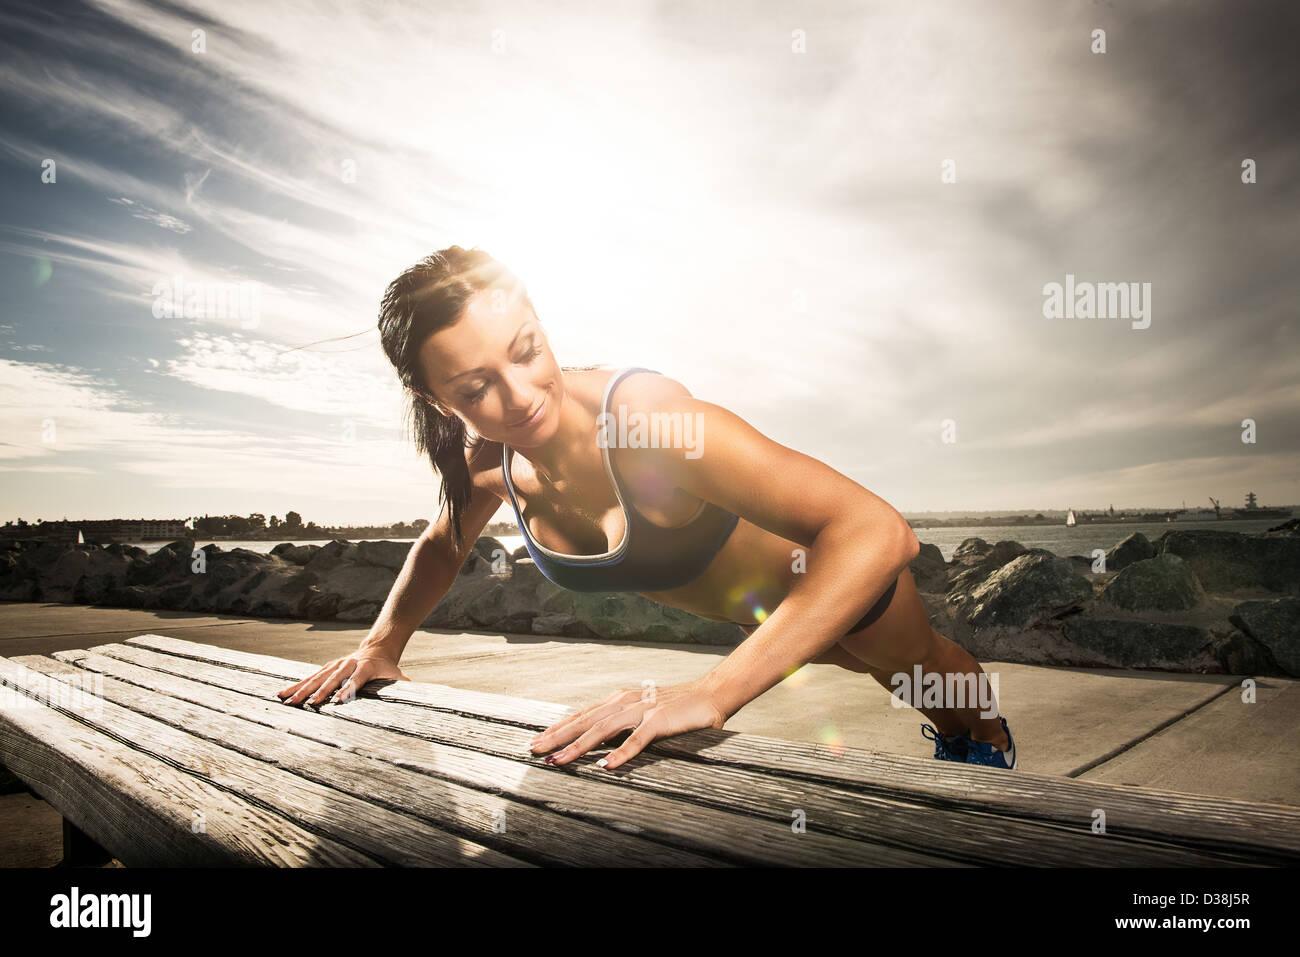 Frau tut Push ups auf Parkbank Stockbild